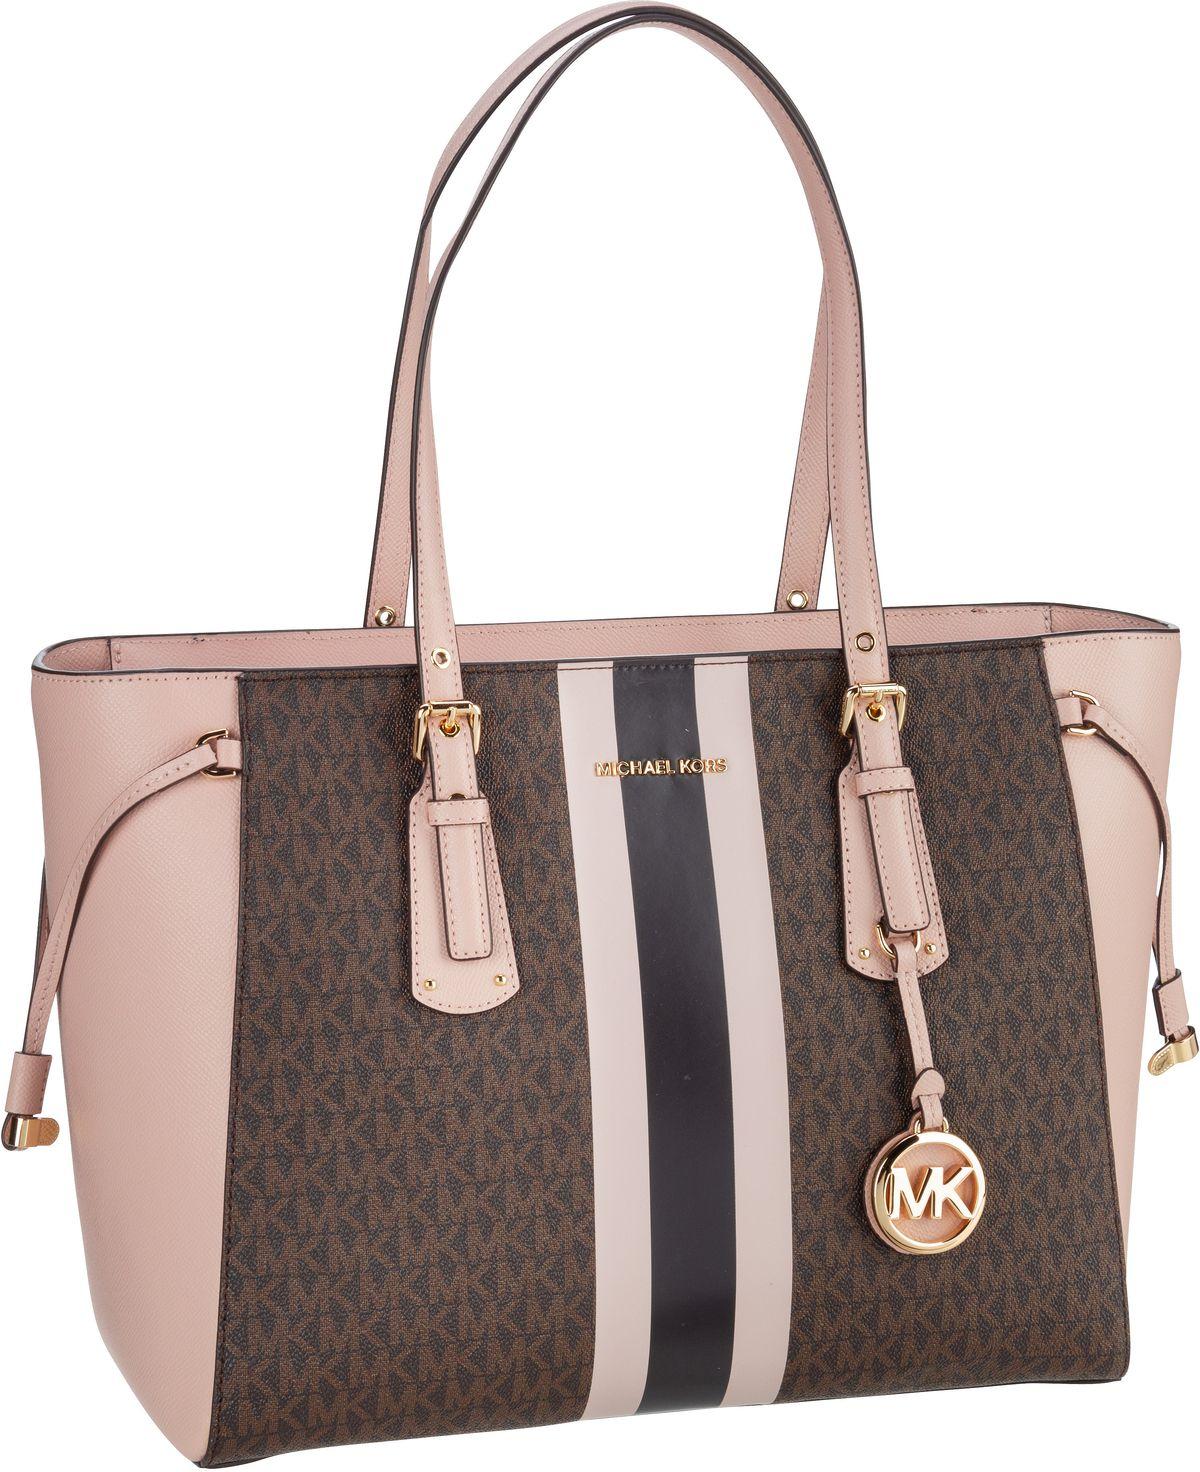 michael kors -  Handtasche Voyager Medium MF TZ Tote MK Signature Stripe Brown/Soft Pink